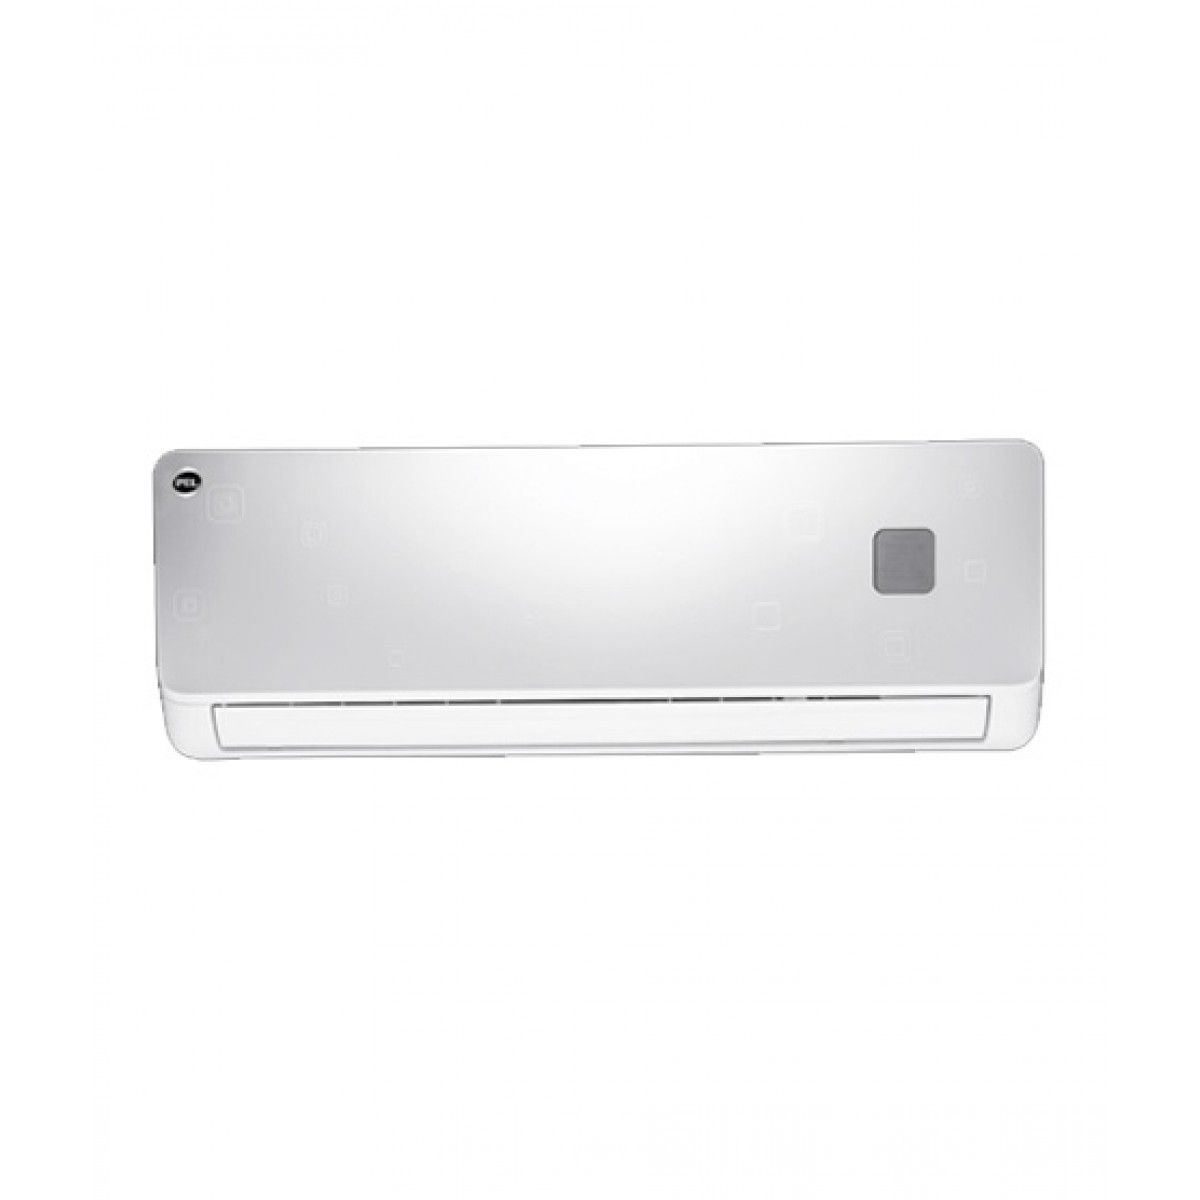 Pel Mid Inverter Ace Series AC 1 Ton (PINV-12K)